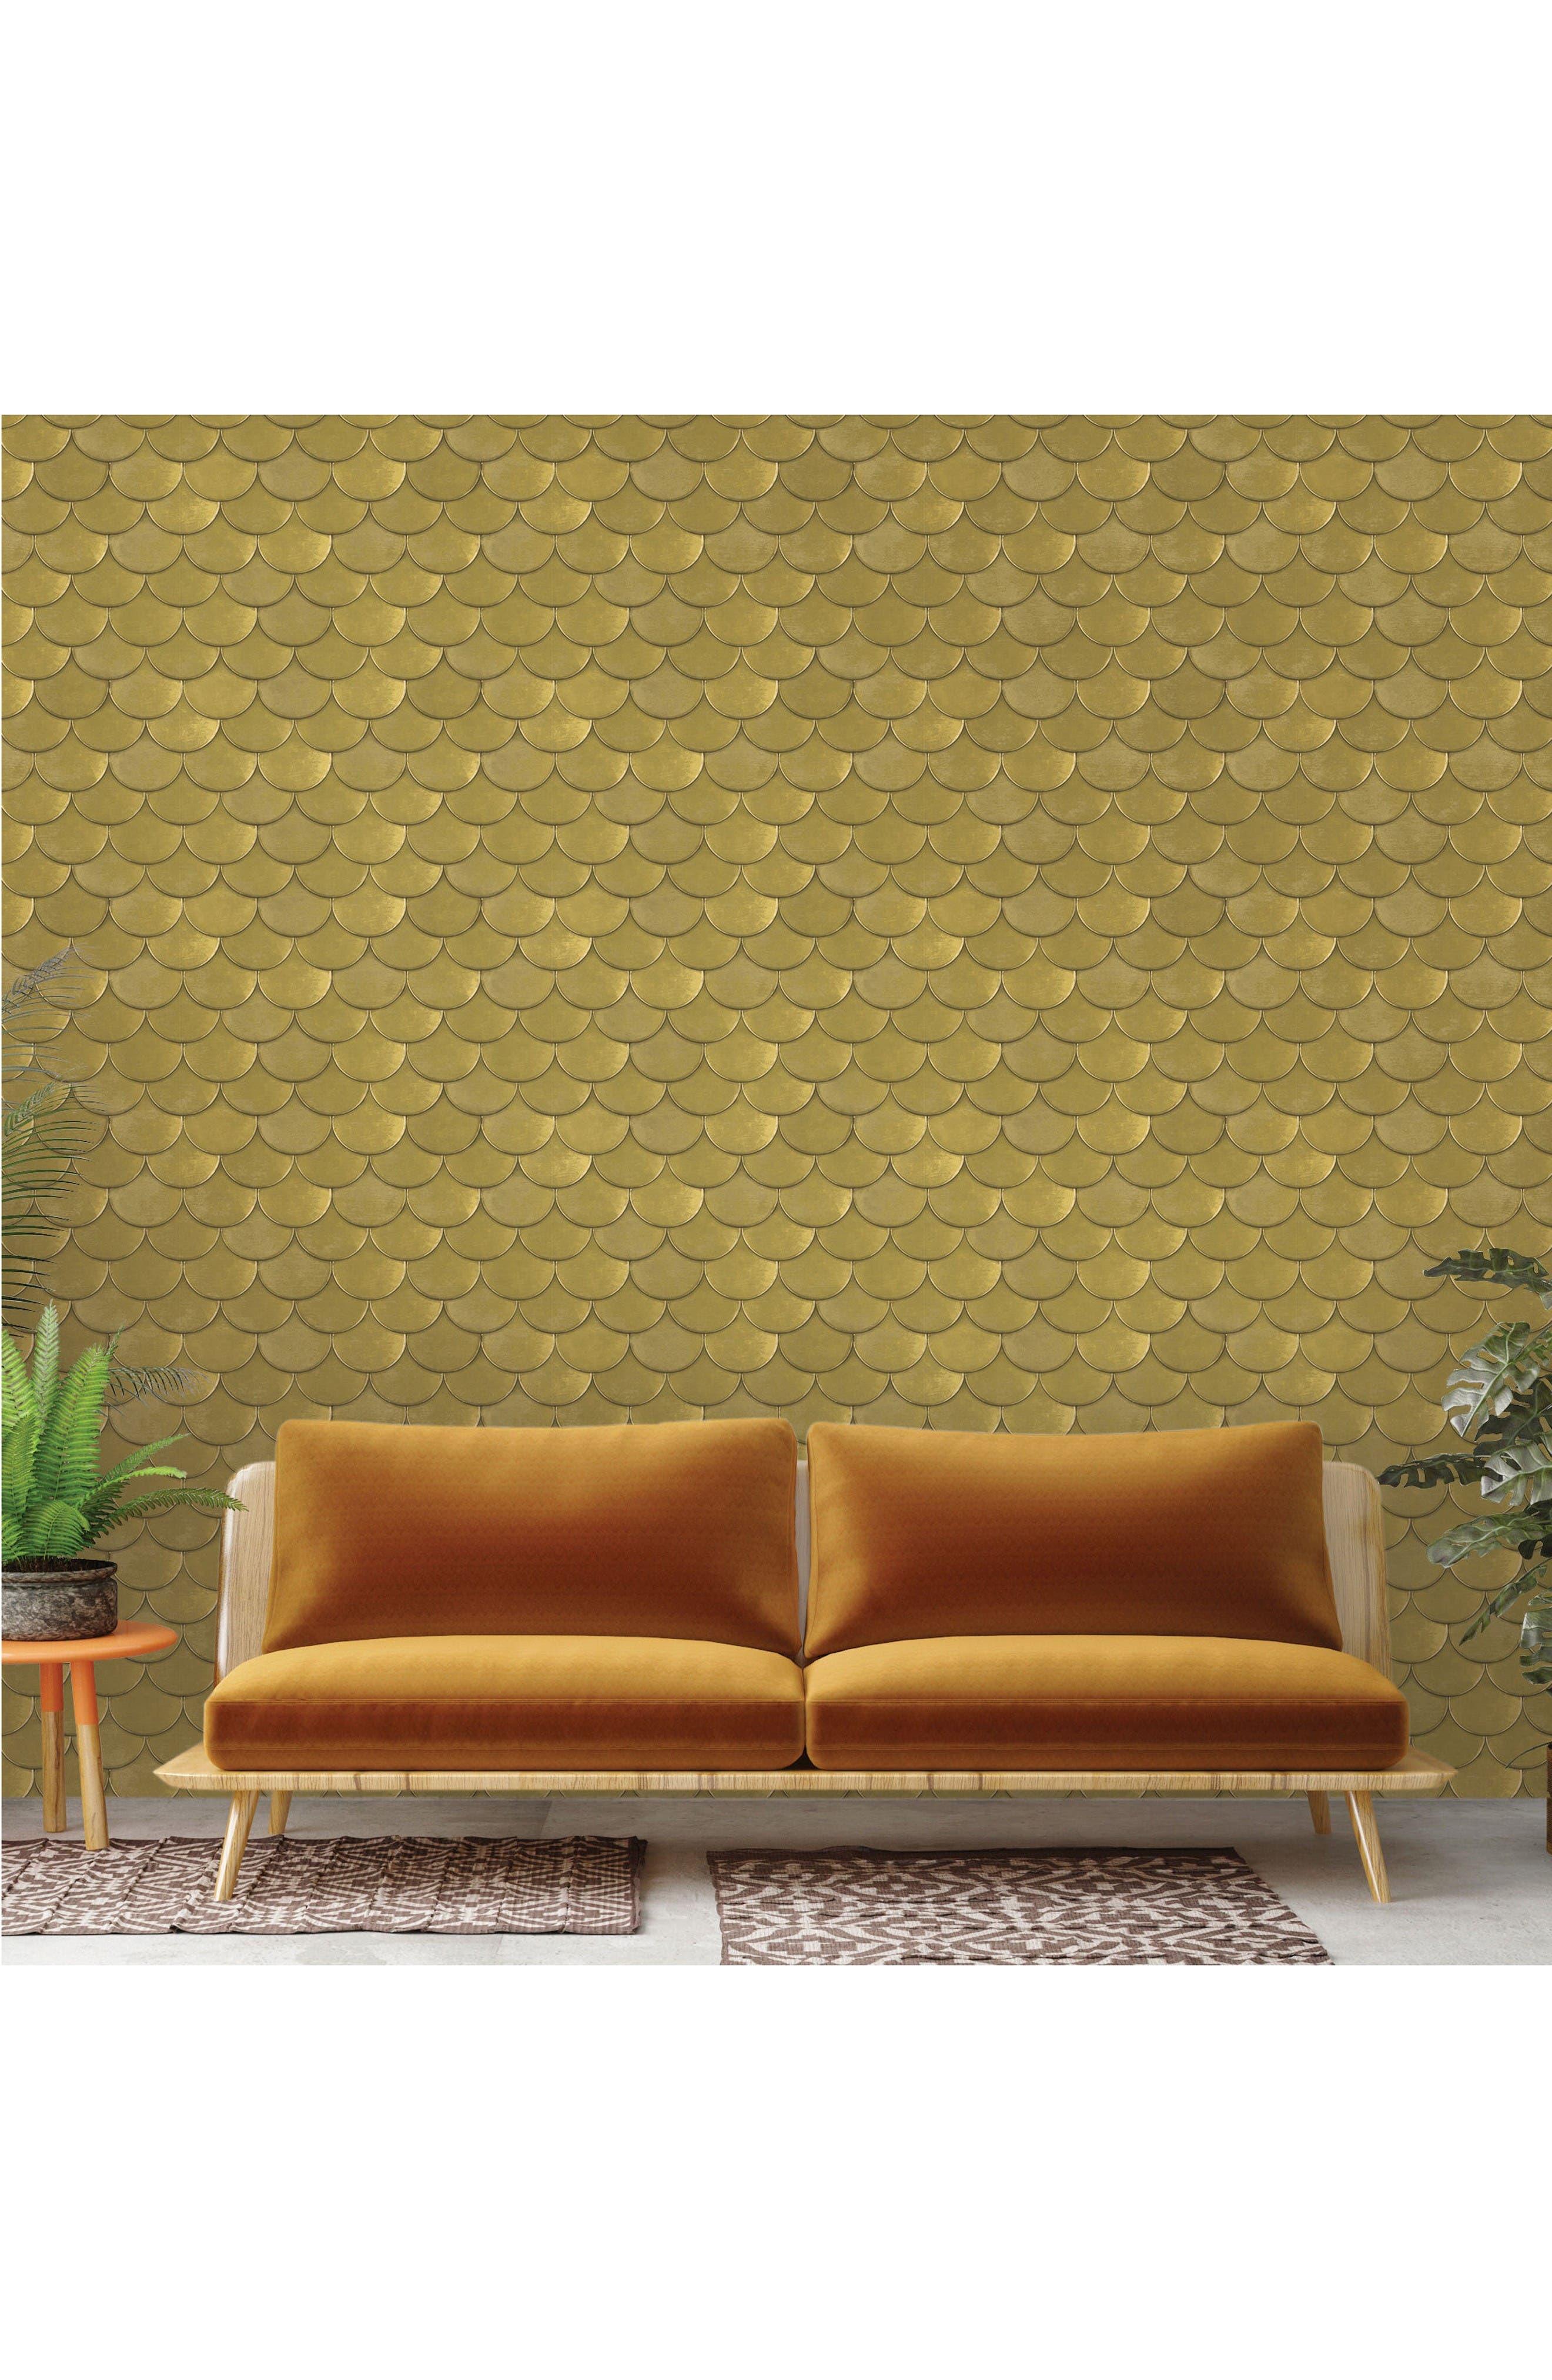 Brass Belly Self-Adhesive Vinyl Wallpaper,                             Alternate thumbnail 2, color,                             Metallic Gold